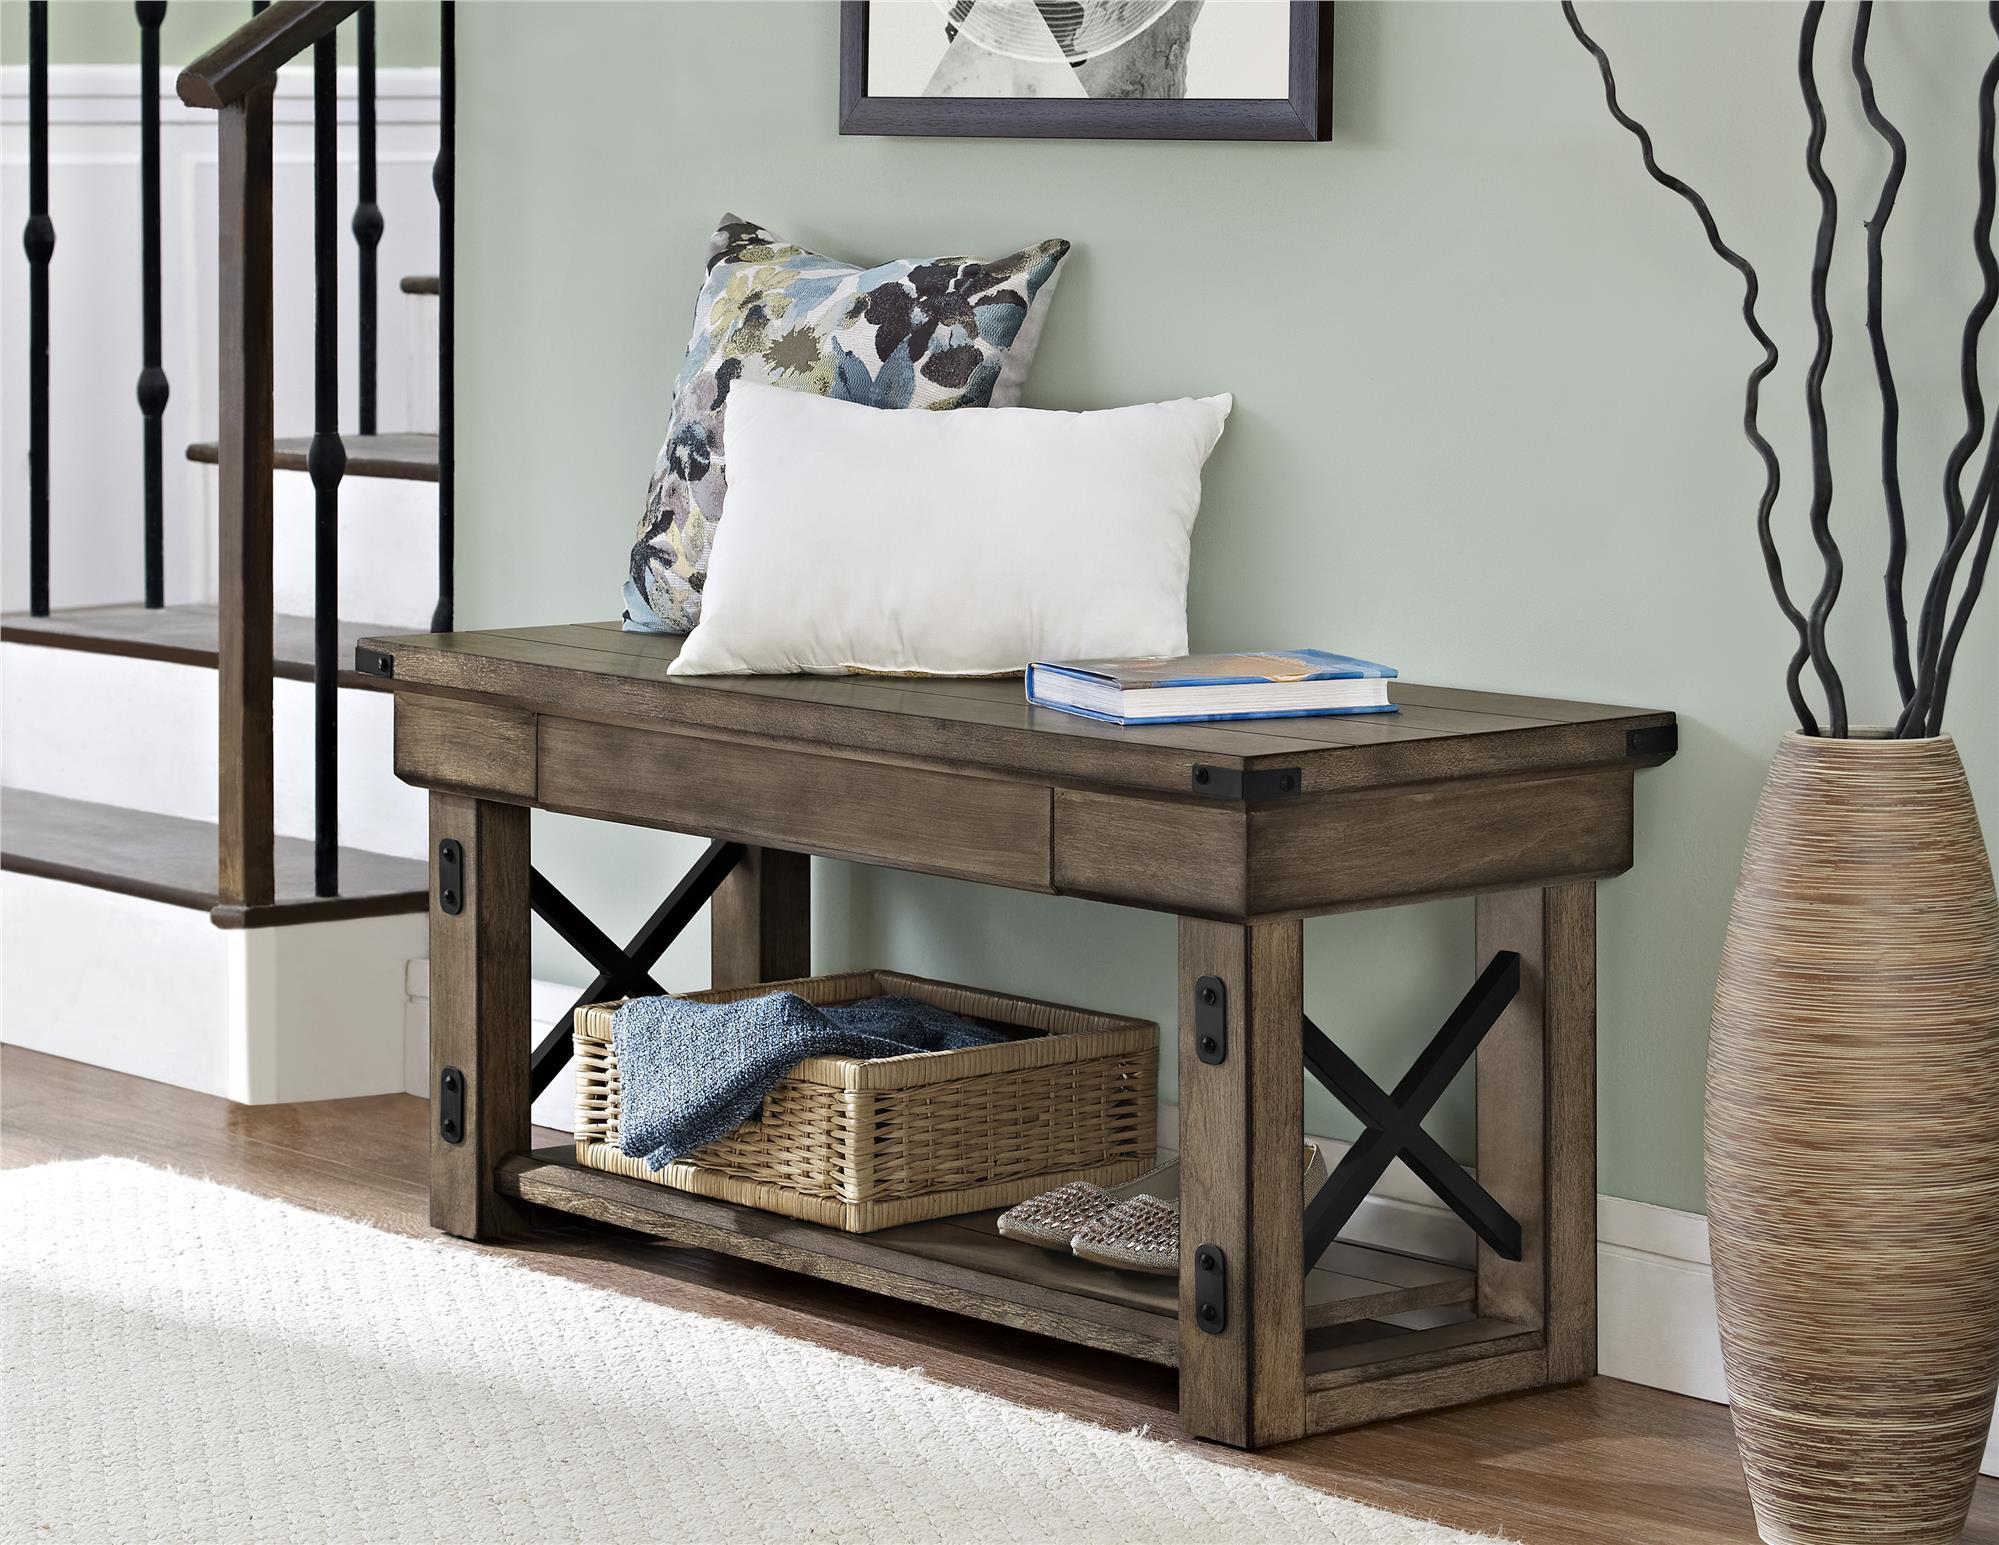 Dorel Home Furnishings Dorel Wildwood Rustic Gray Entryway Bench PartNumber: 00865143000P KsnValue: 00865143000 MfgPartNumber: 5054096PCOM